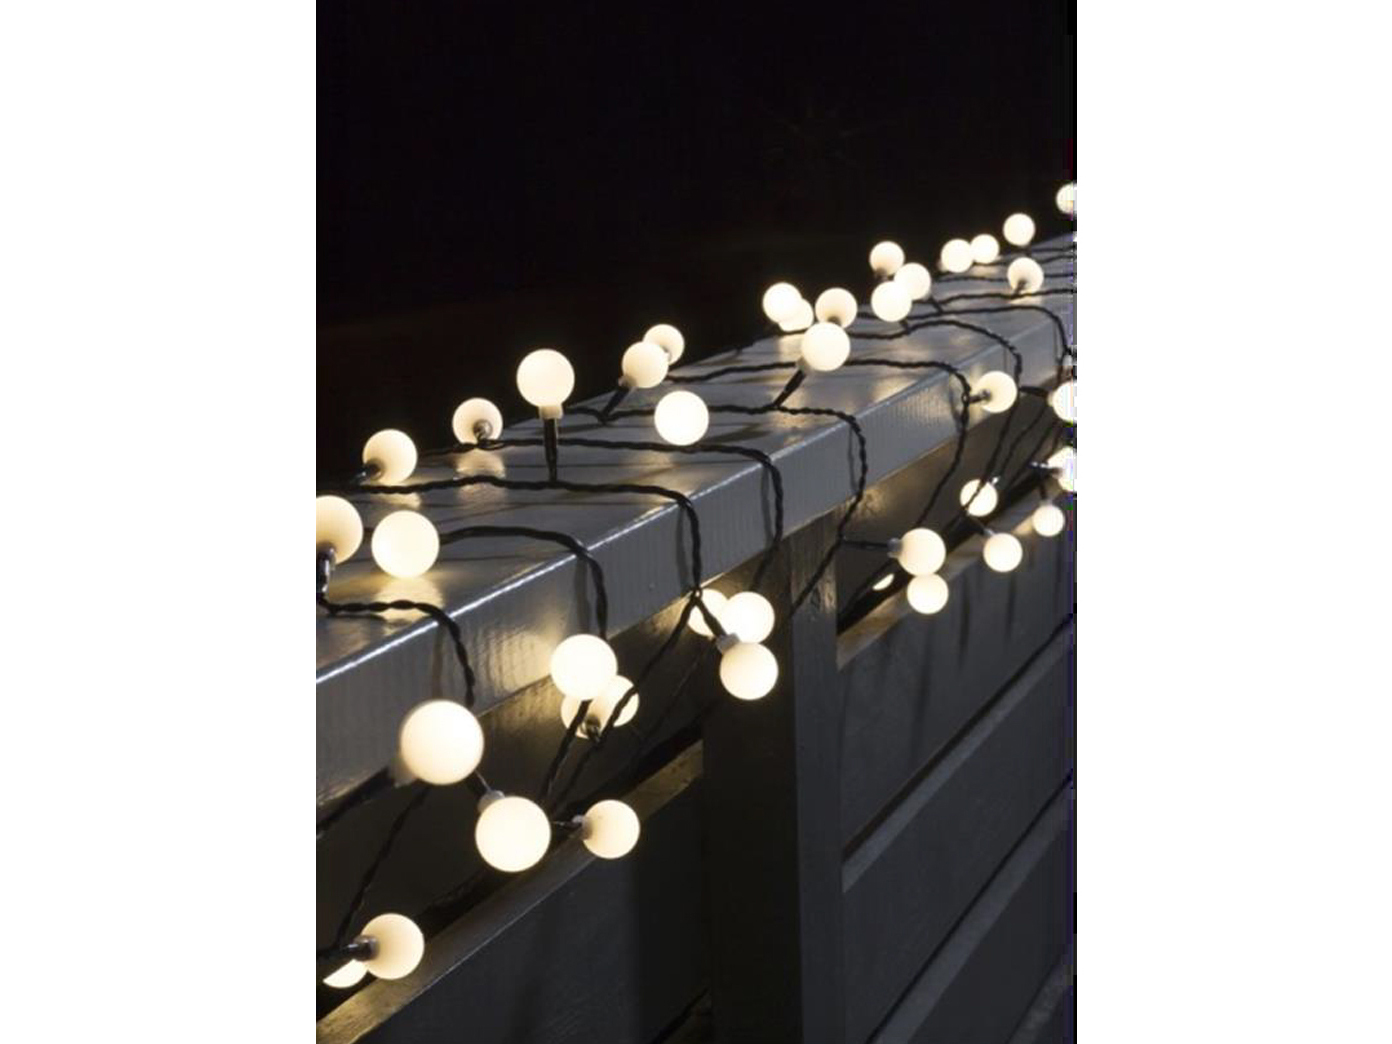 deko lichterkette 80 runde led dioden ip44 lichterkette kugeln au en dekoleuchte ebay. Black Bedroom Furniture Sets. Home Design Ideas